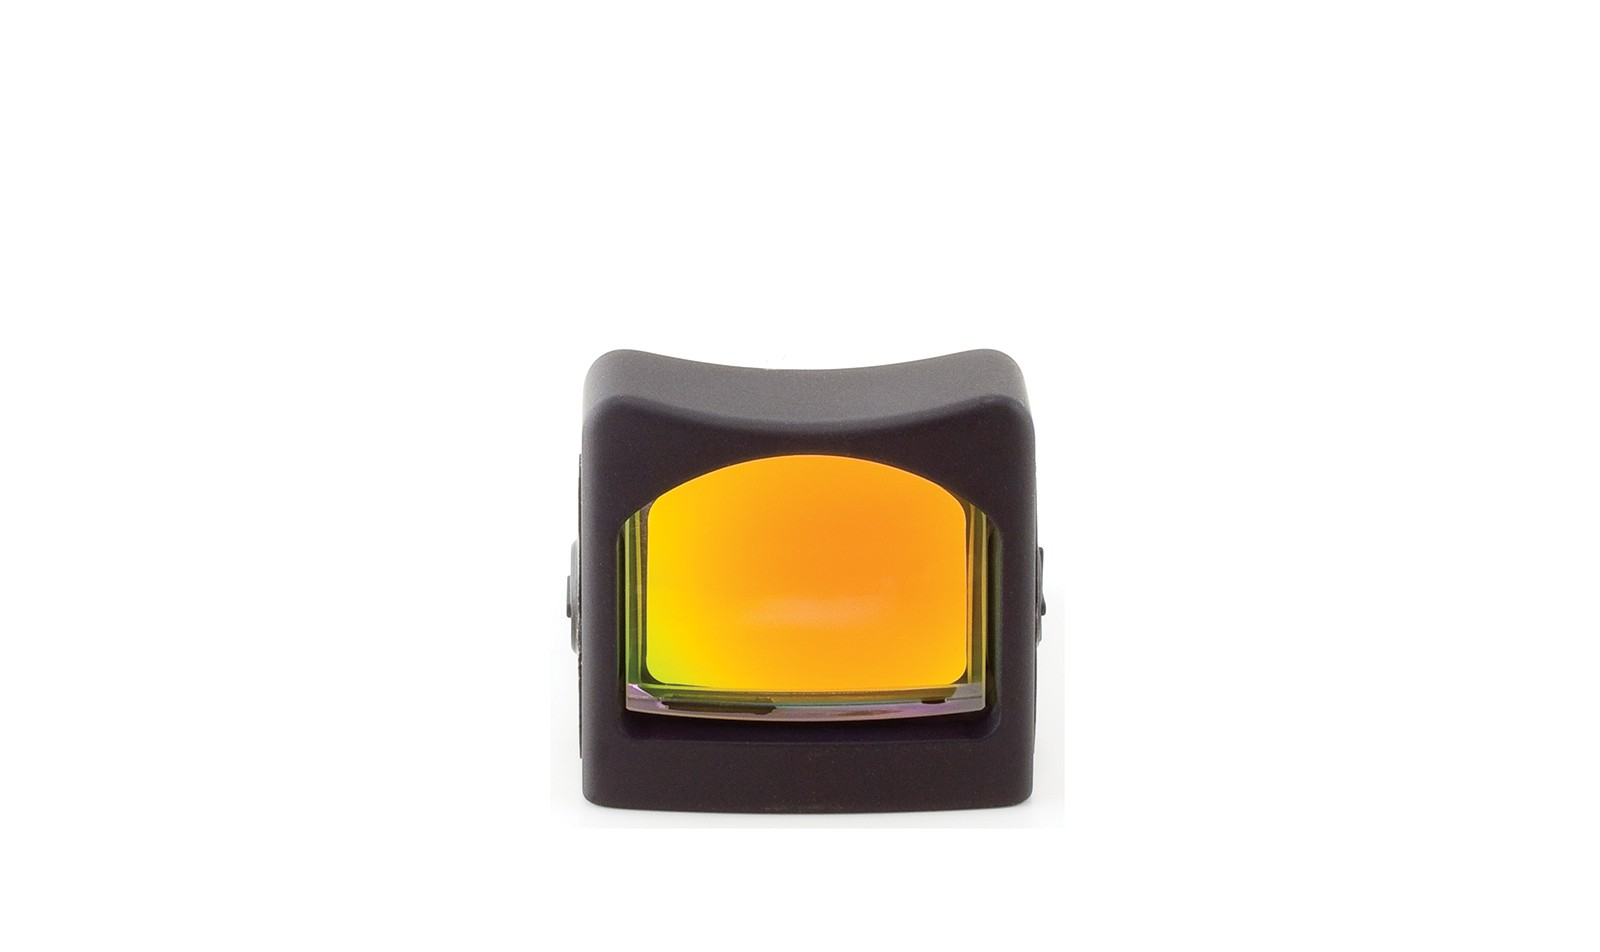 Trijicon RMR Typ 2 Red Dot Sight 6.5 MOA Adjustable LED Bild 11